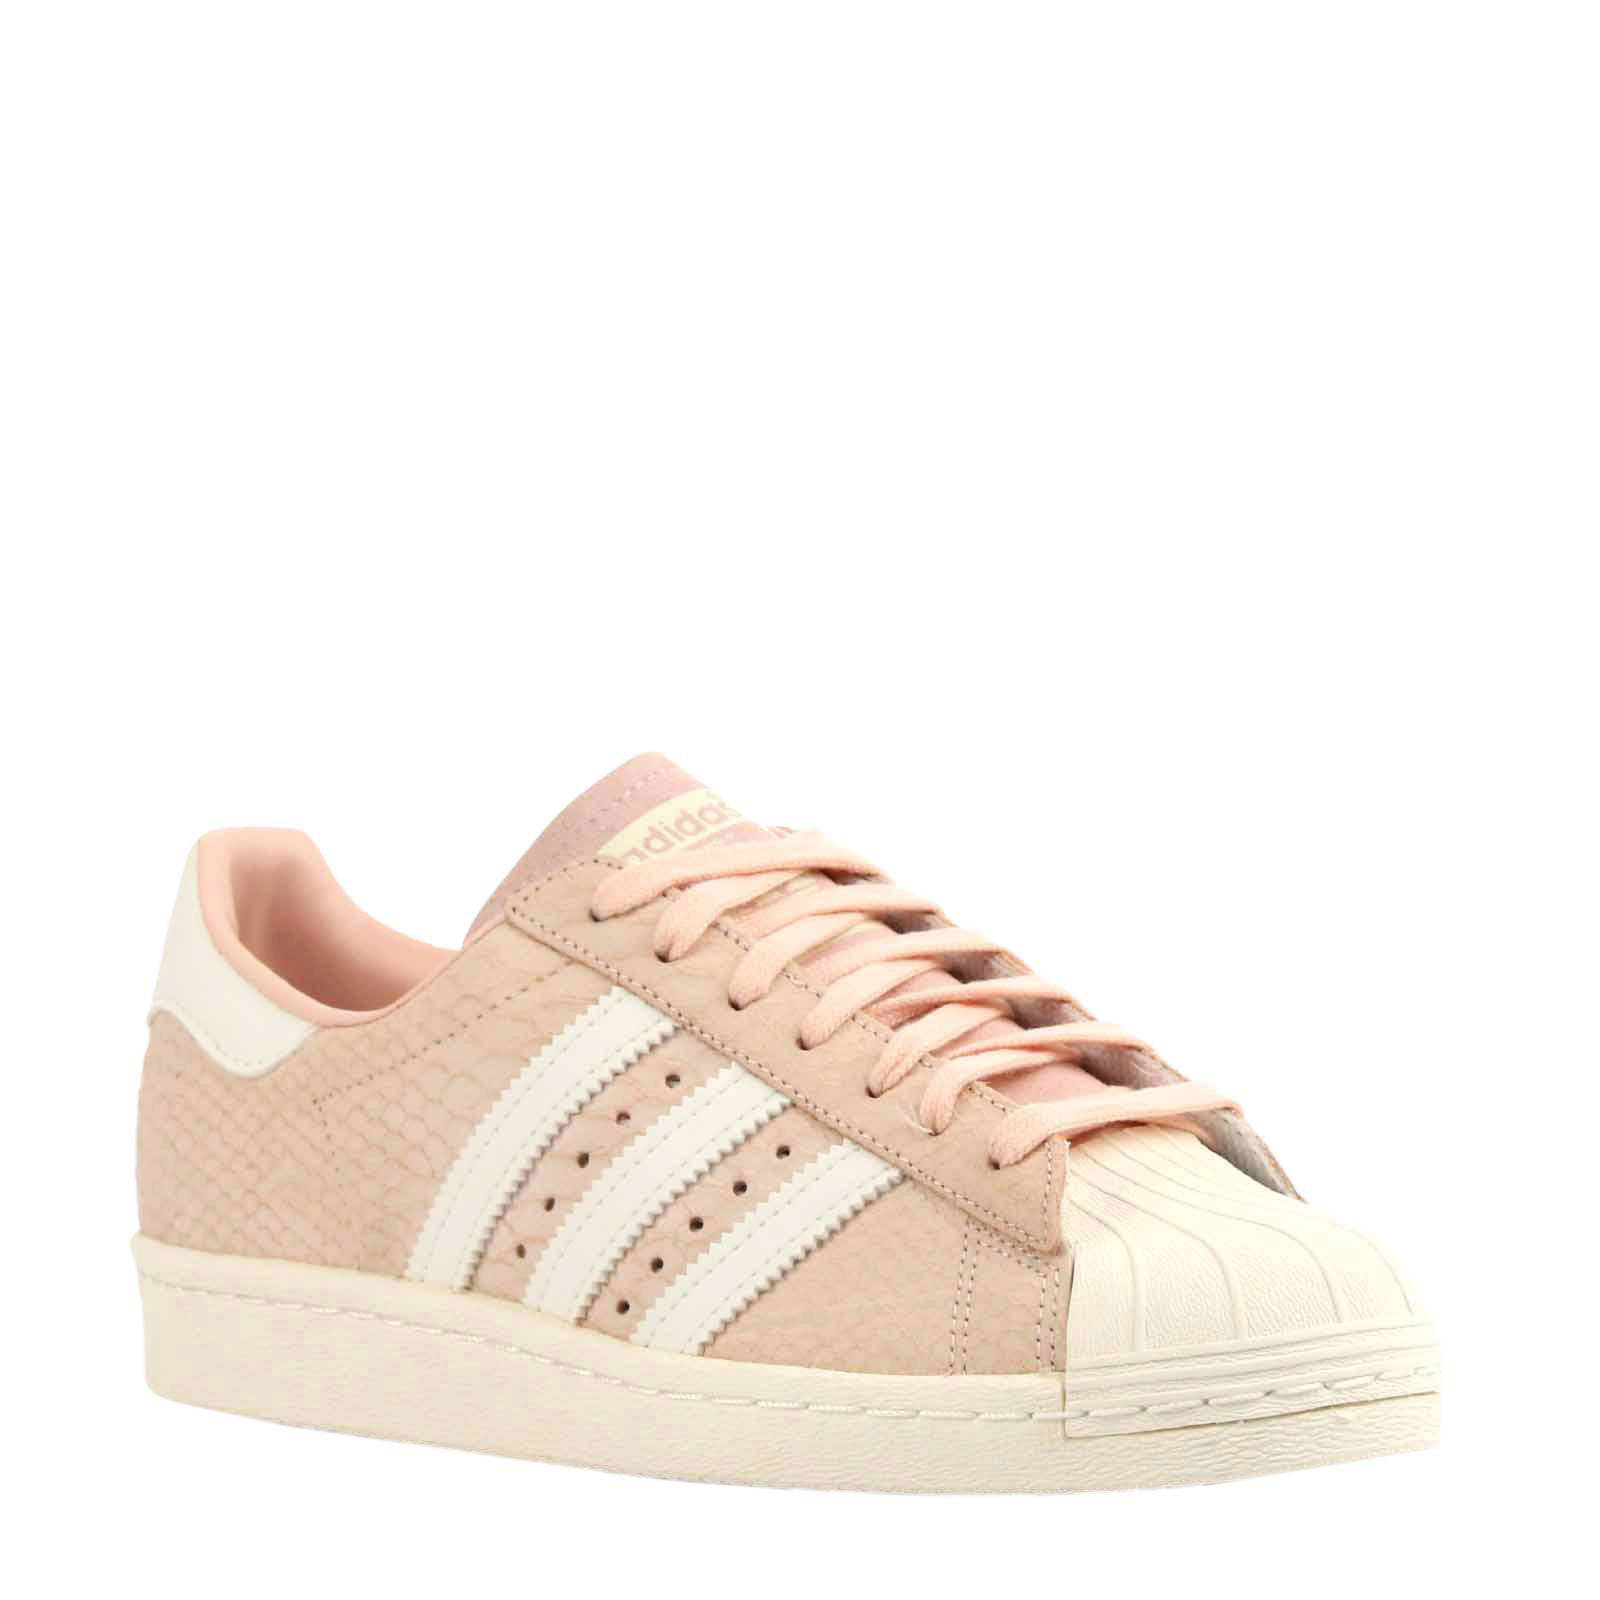 adidas superstar roze suede